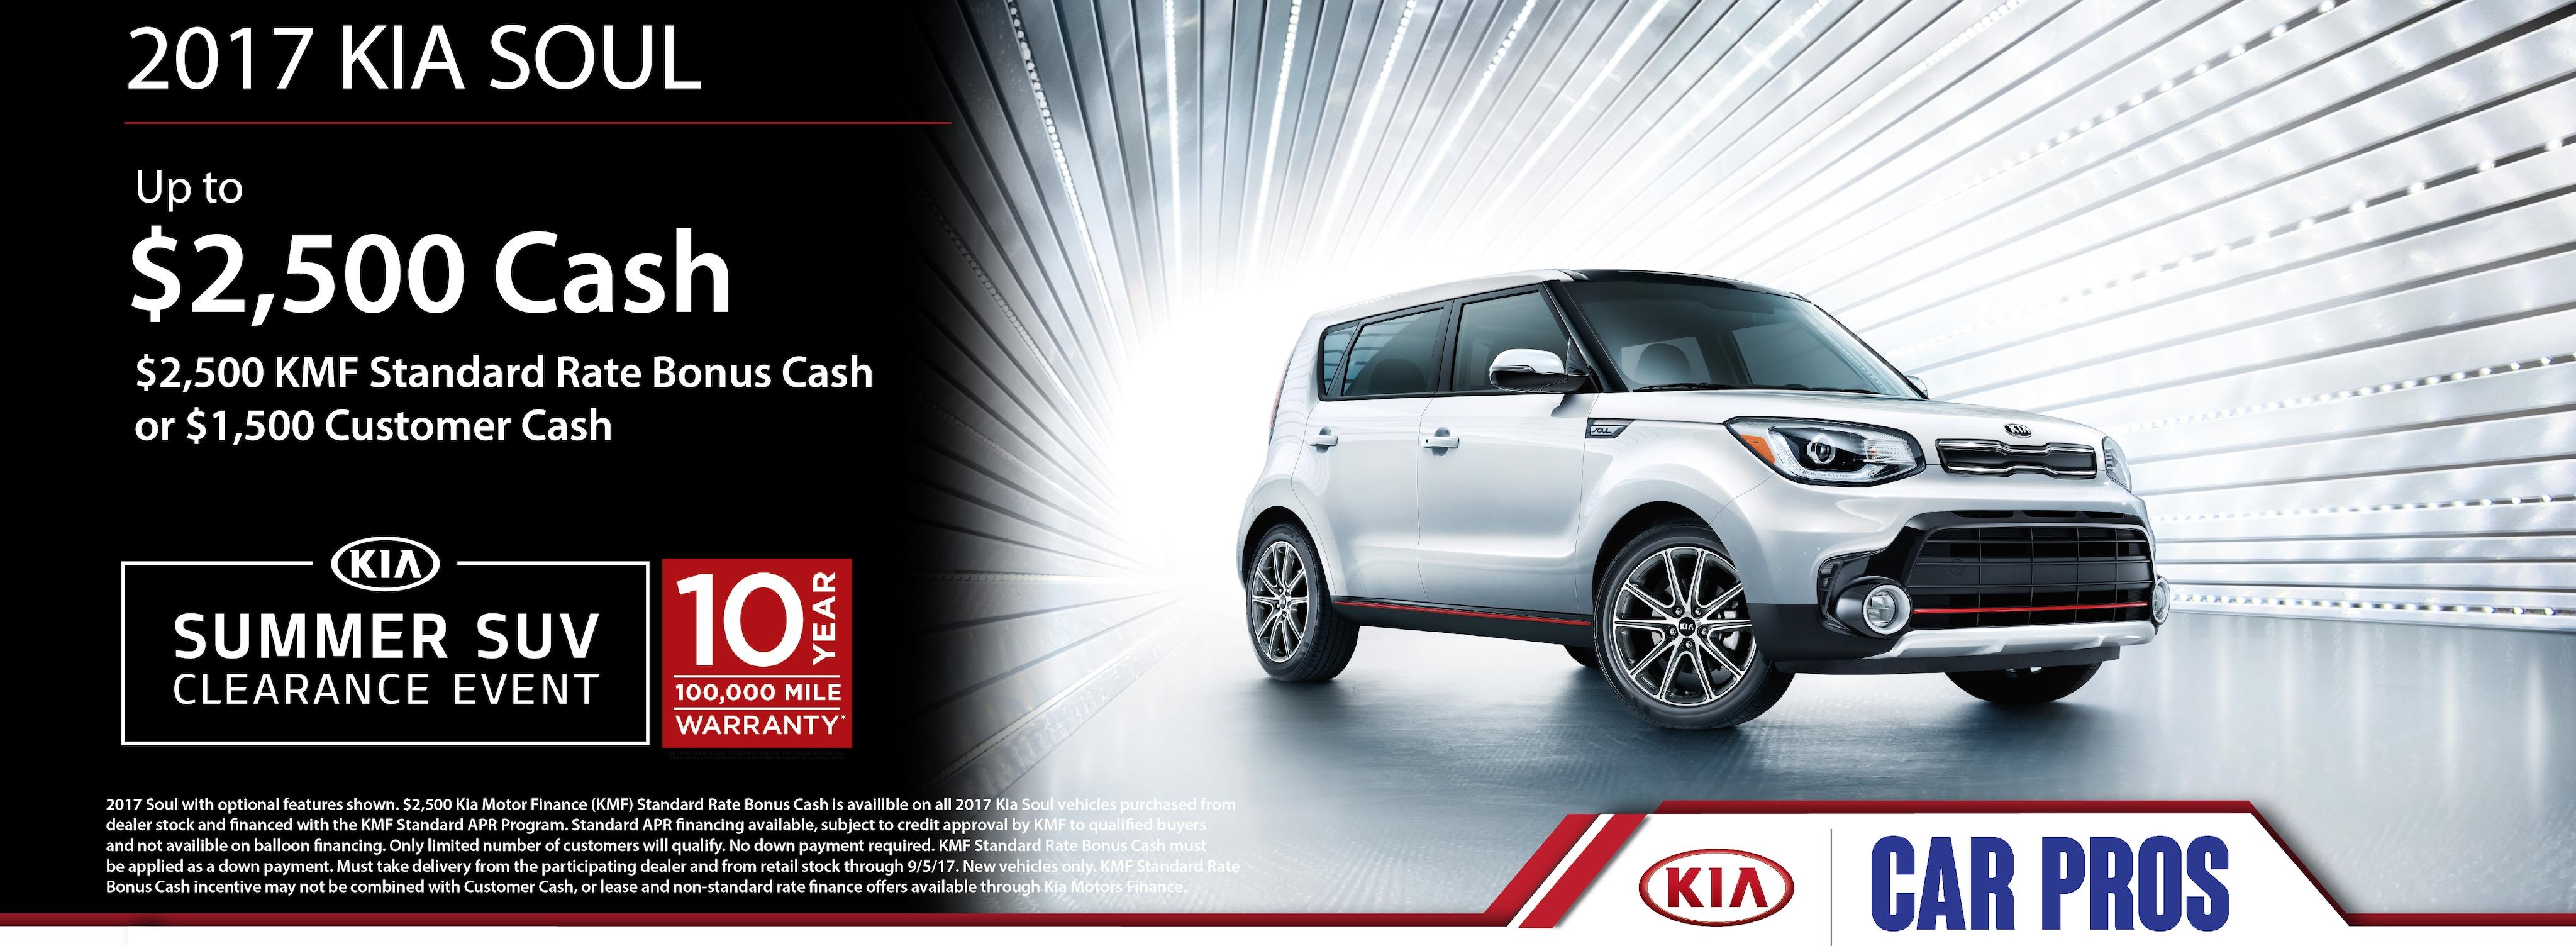 kia dealership serves la carson car pros kia carson